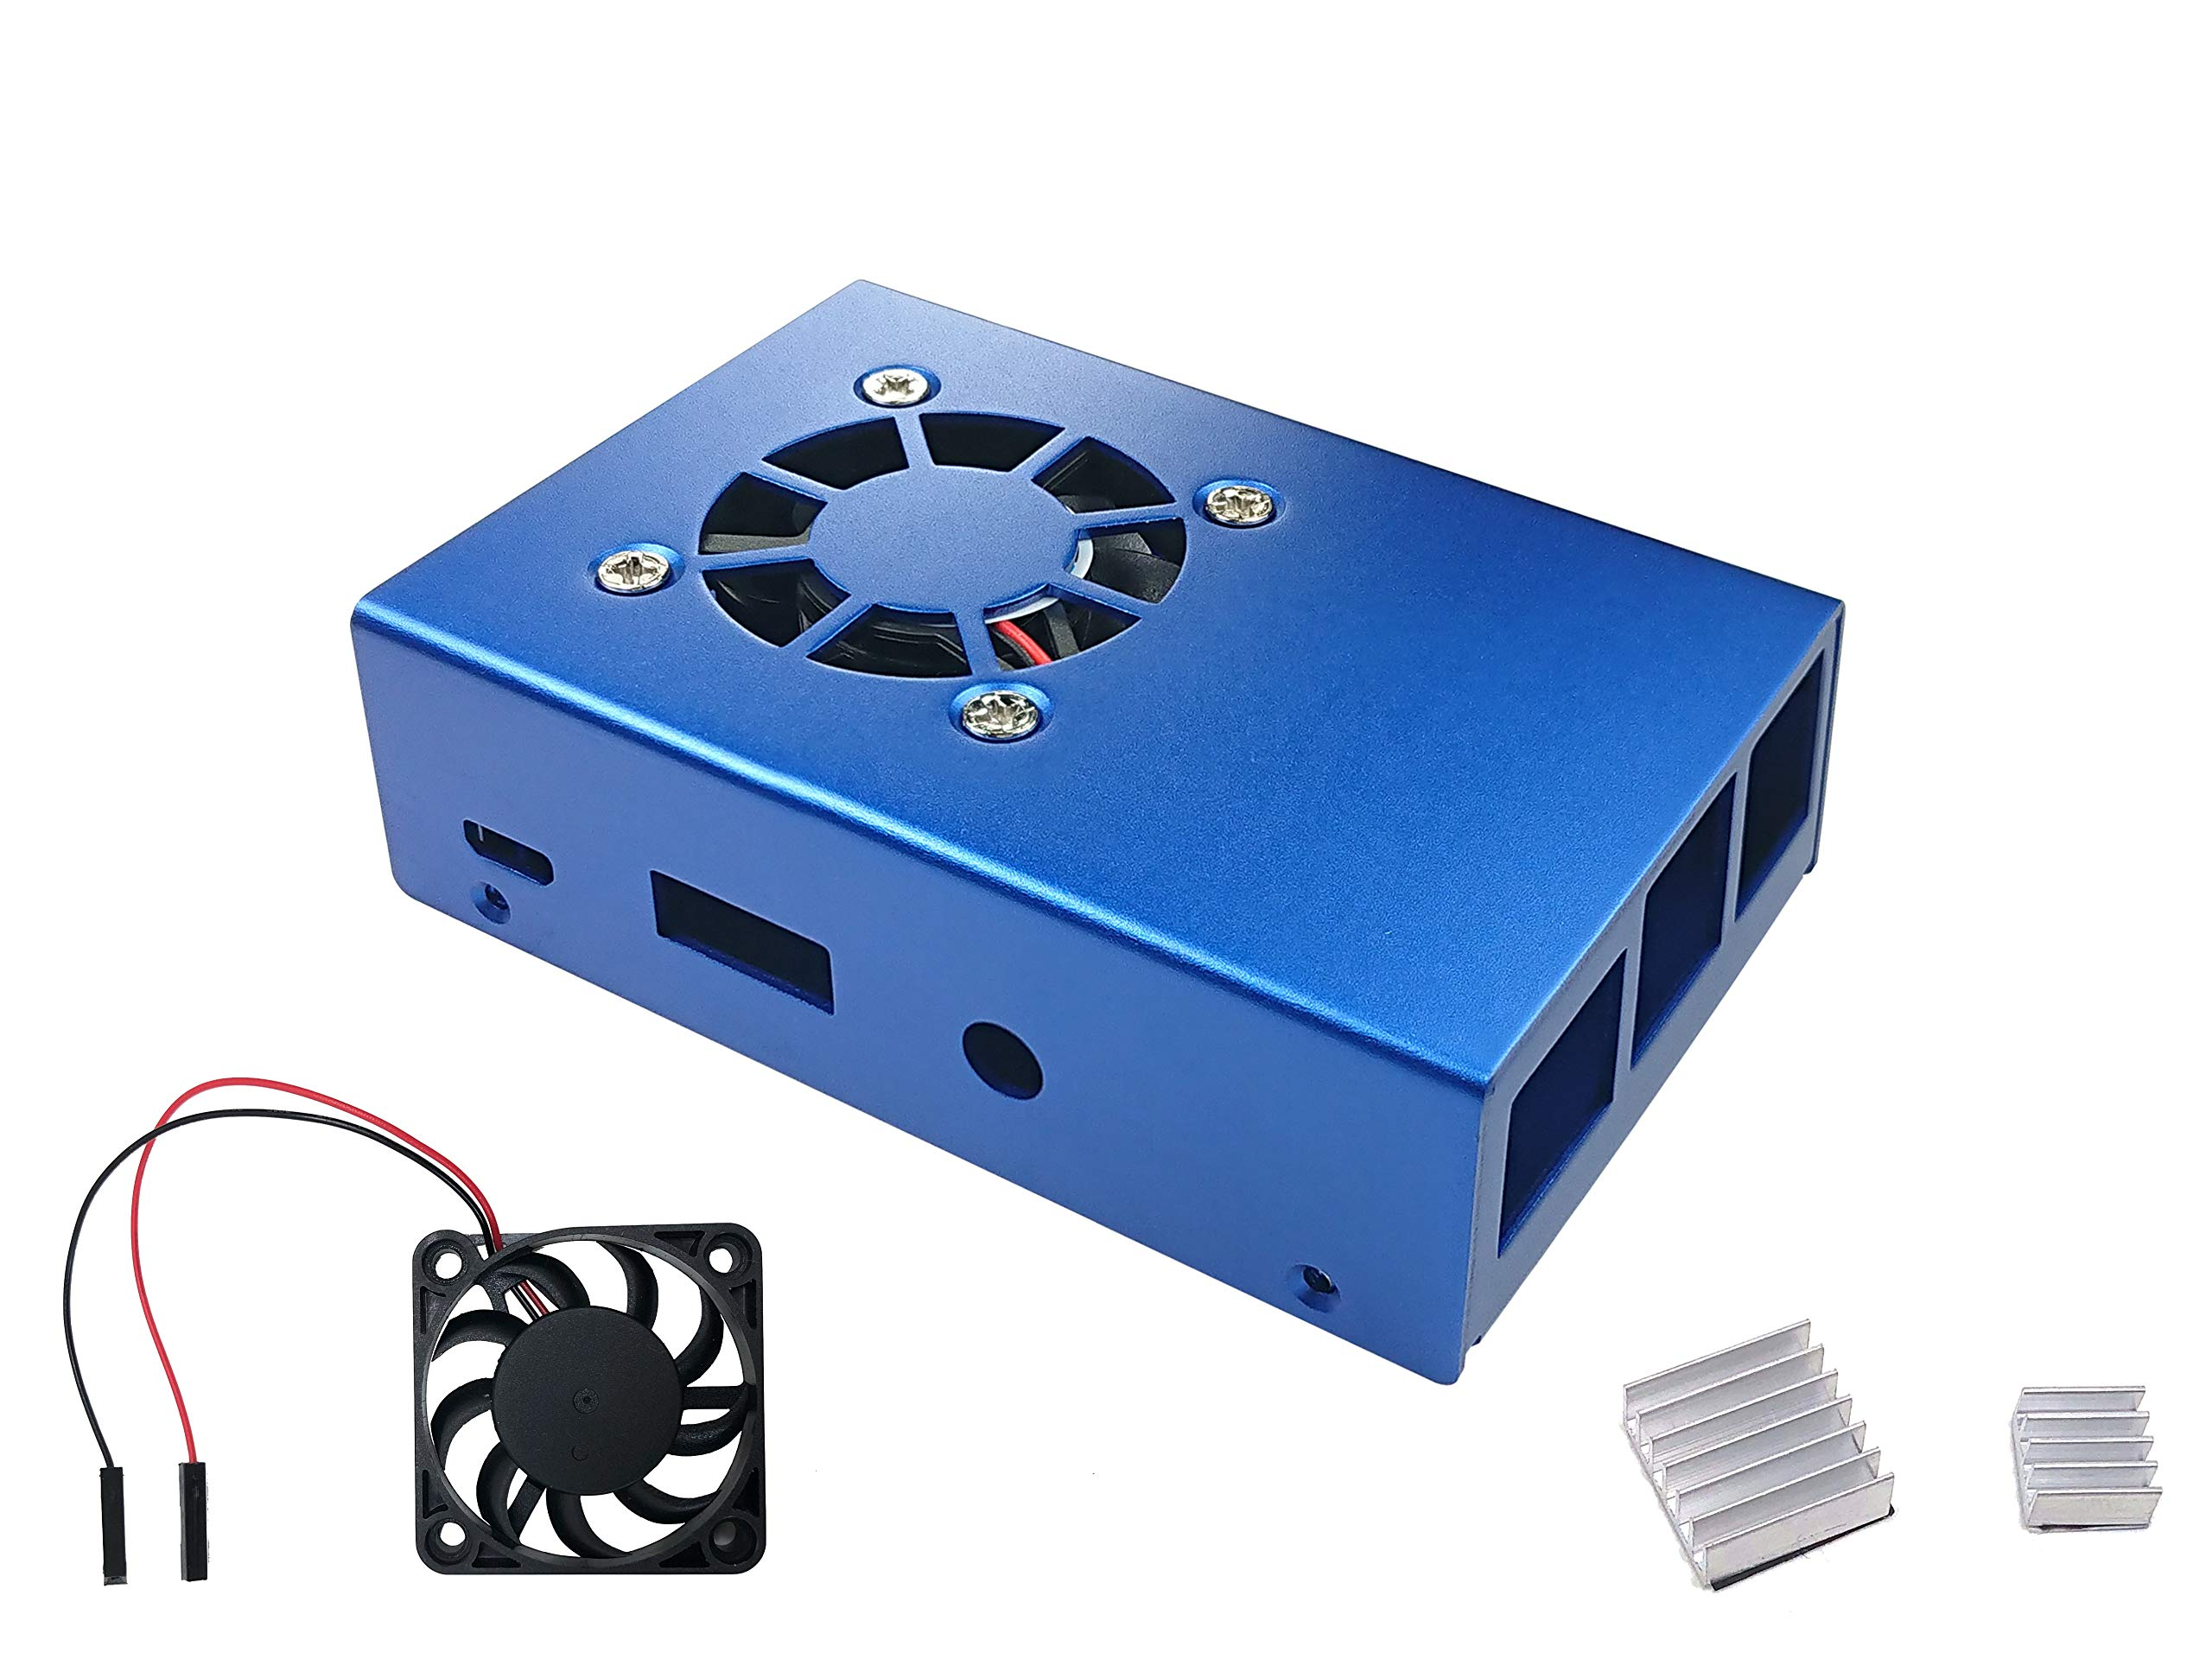 Micro Connectors Aluminum Raspberry Pi 3 Model B B+ Case with Fan and Heatsinks - Blue (RAS-PCS04-BL)